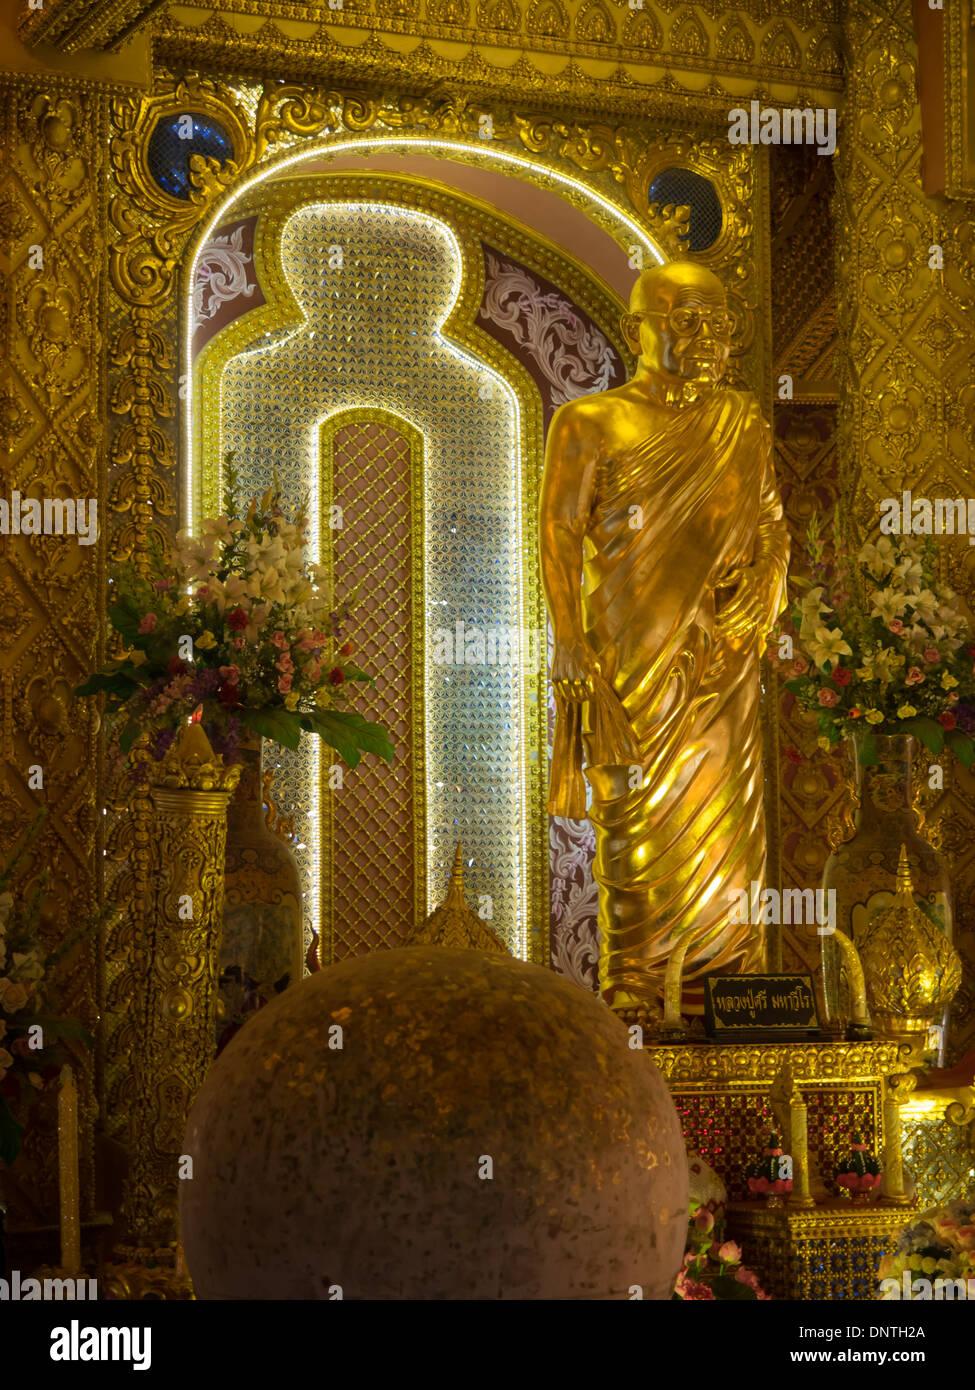 Revered Monk Statue at Phra Maha Chedi Mongkol, Roi Et, Thailand - Stock Image